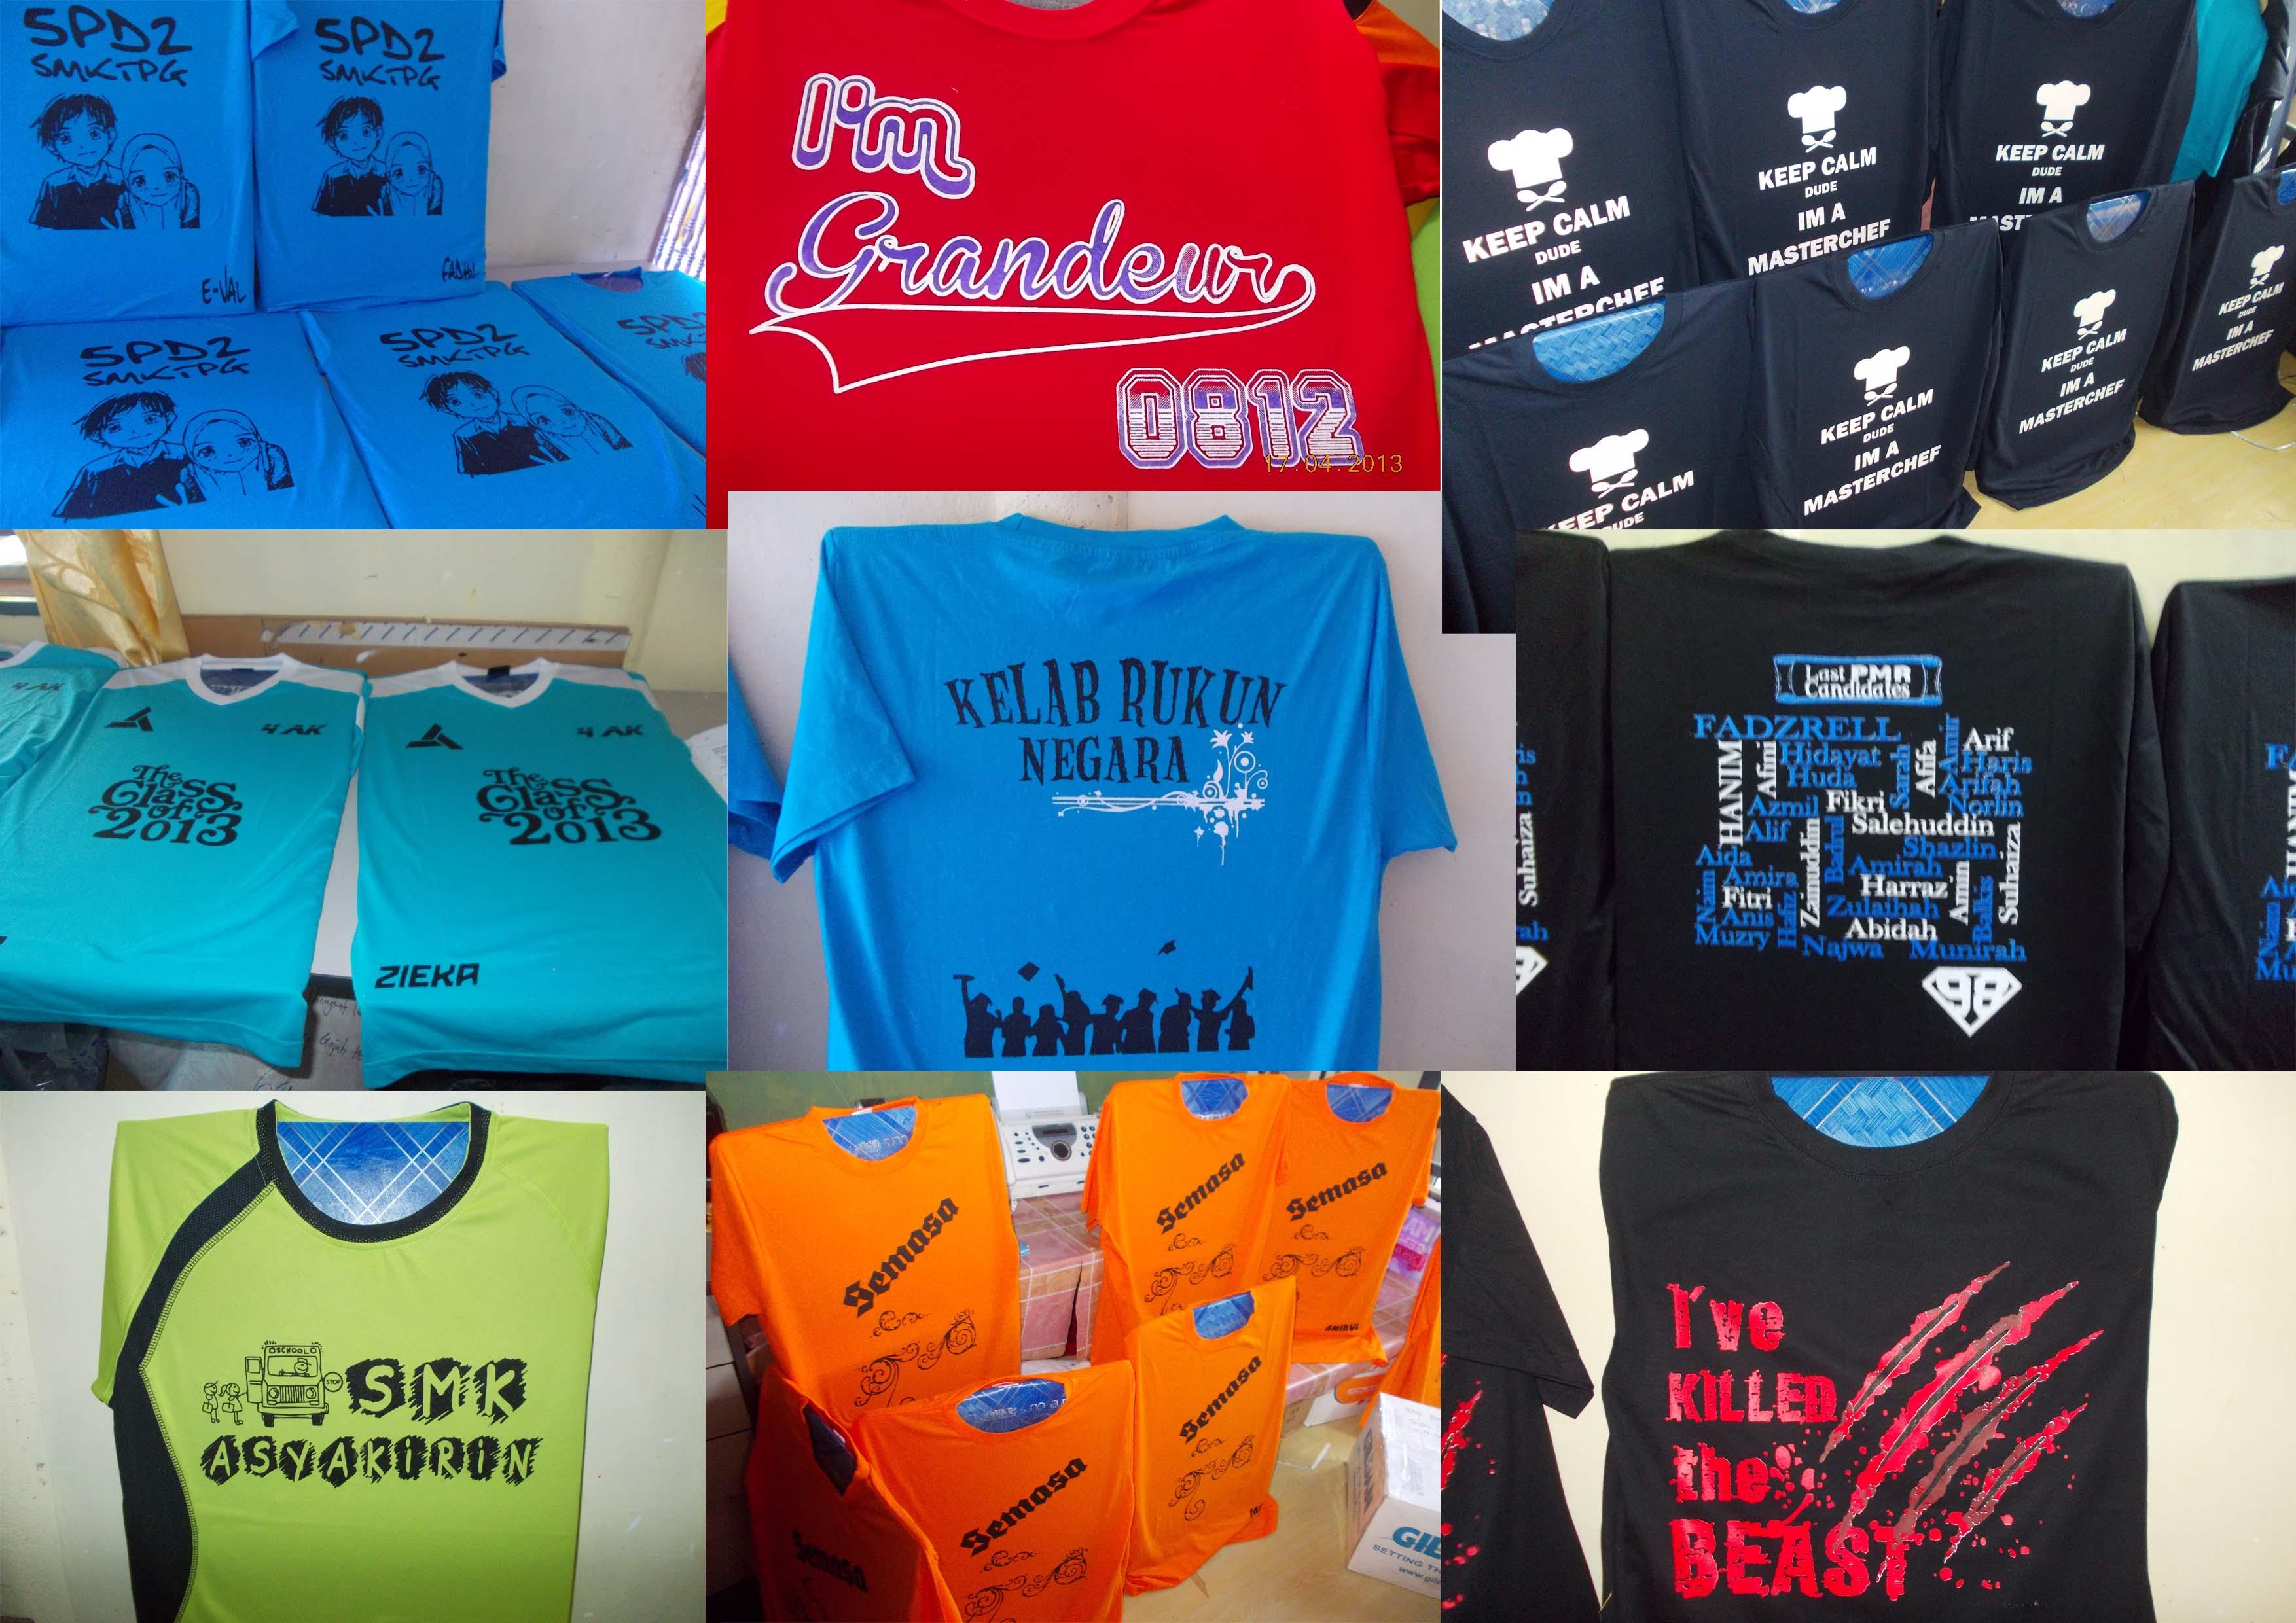 Contoh design tshirt kelas - Klik Sini Untuk Pelbagai Contoh Tshirt Siap